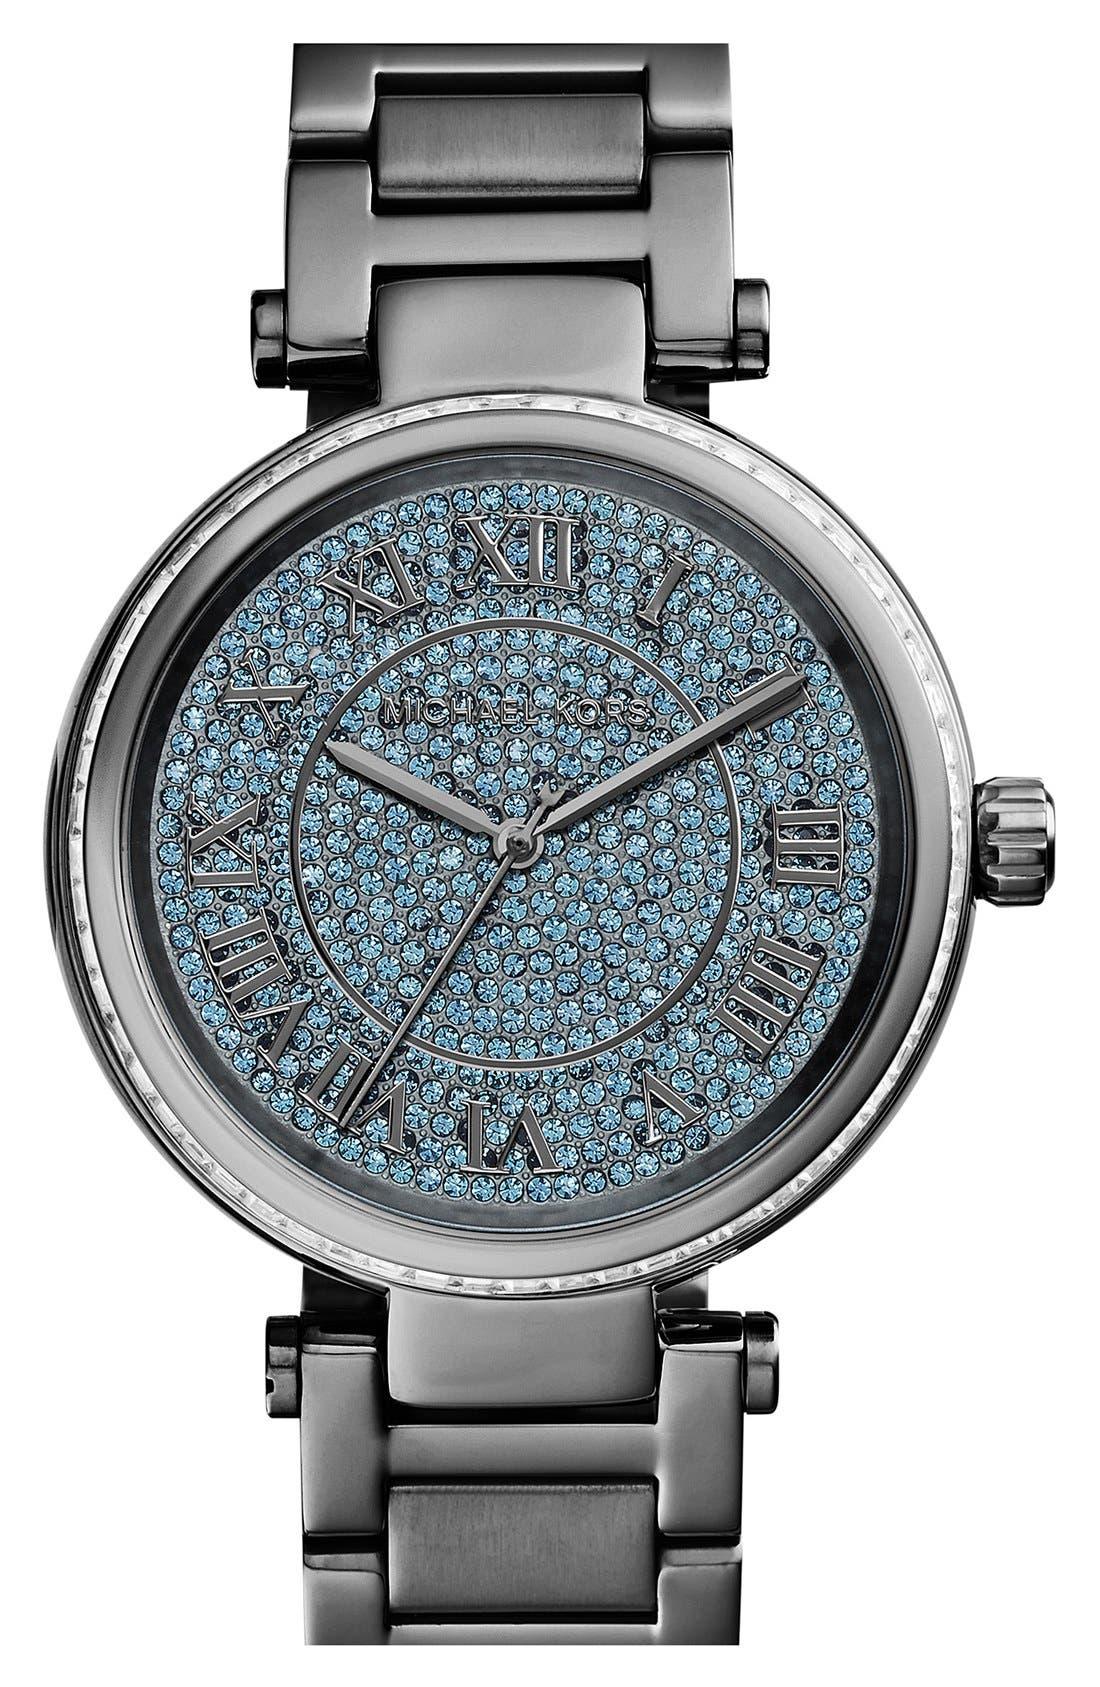 Alternate Image 1 Selected - Michael Kors 'Skylar' Pavé Dial Crystal Bezel Bracelet Watch, 42mm